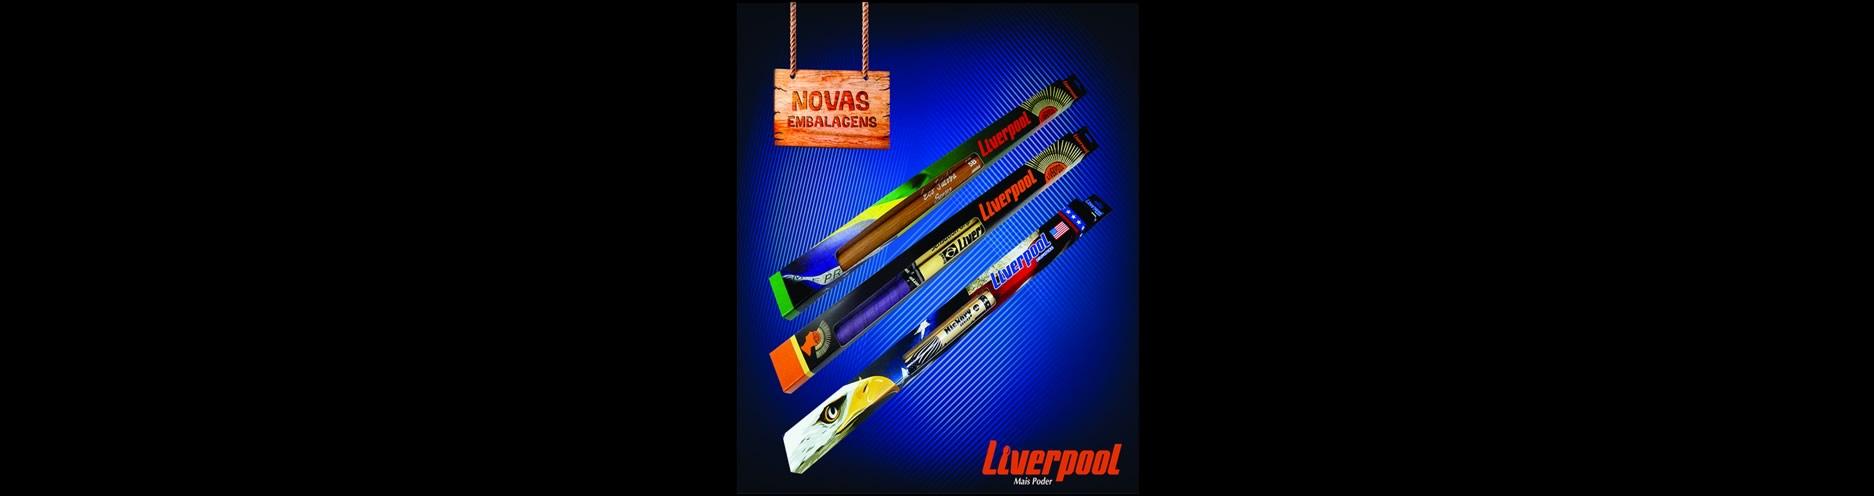 banner-liverpool2